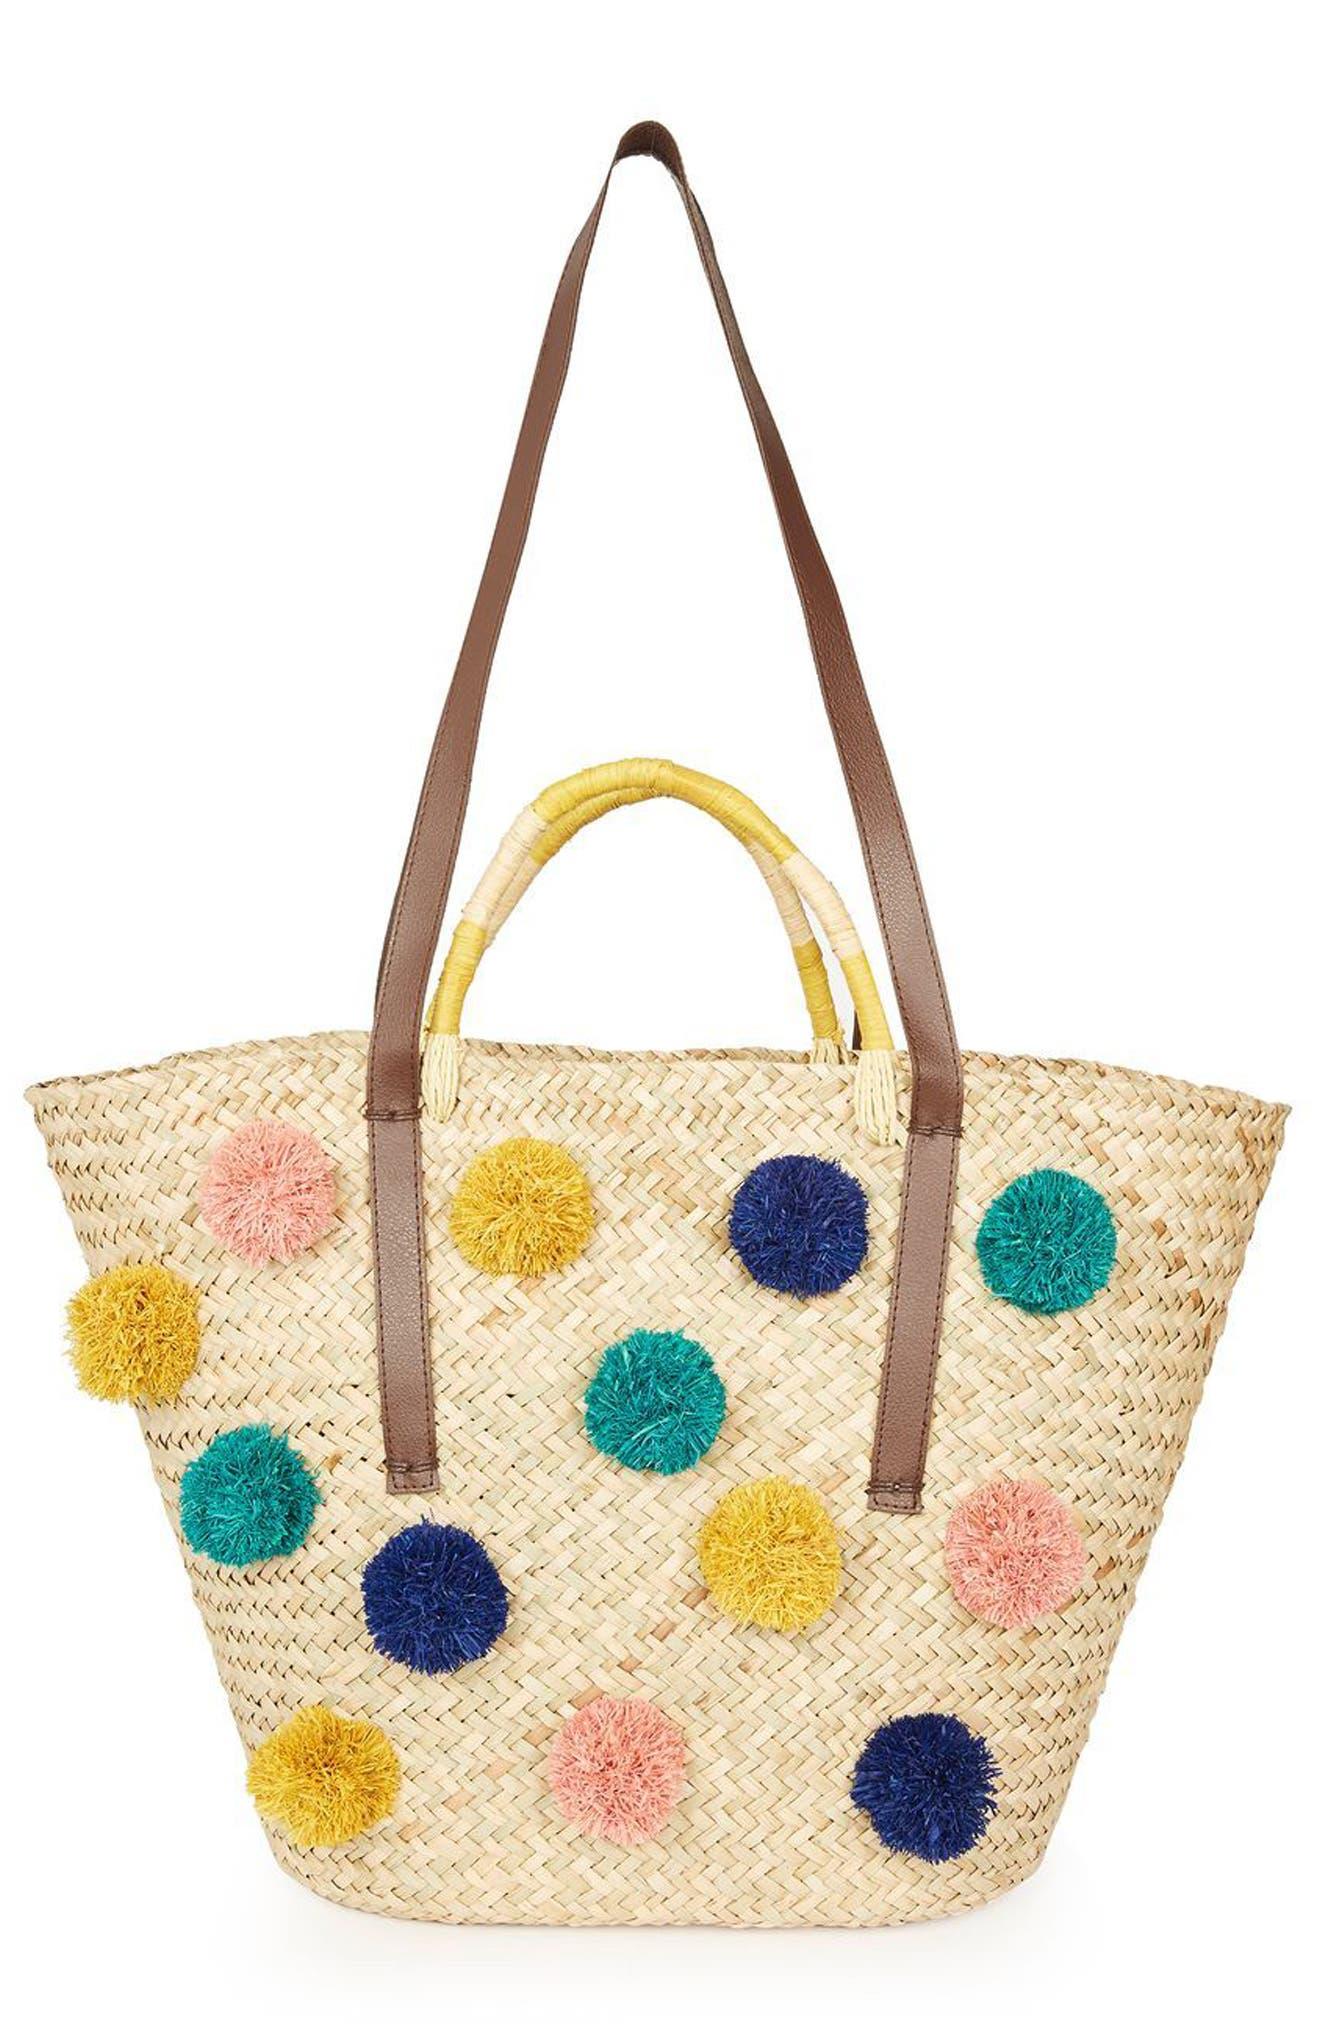 Alternate Image 1 Selected - Topshop Pompom Straw Tote Bag